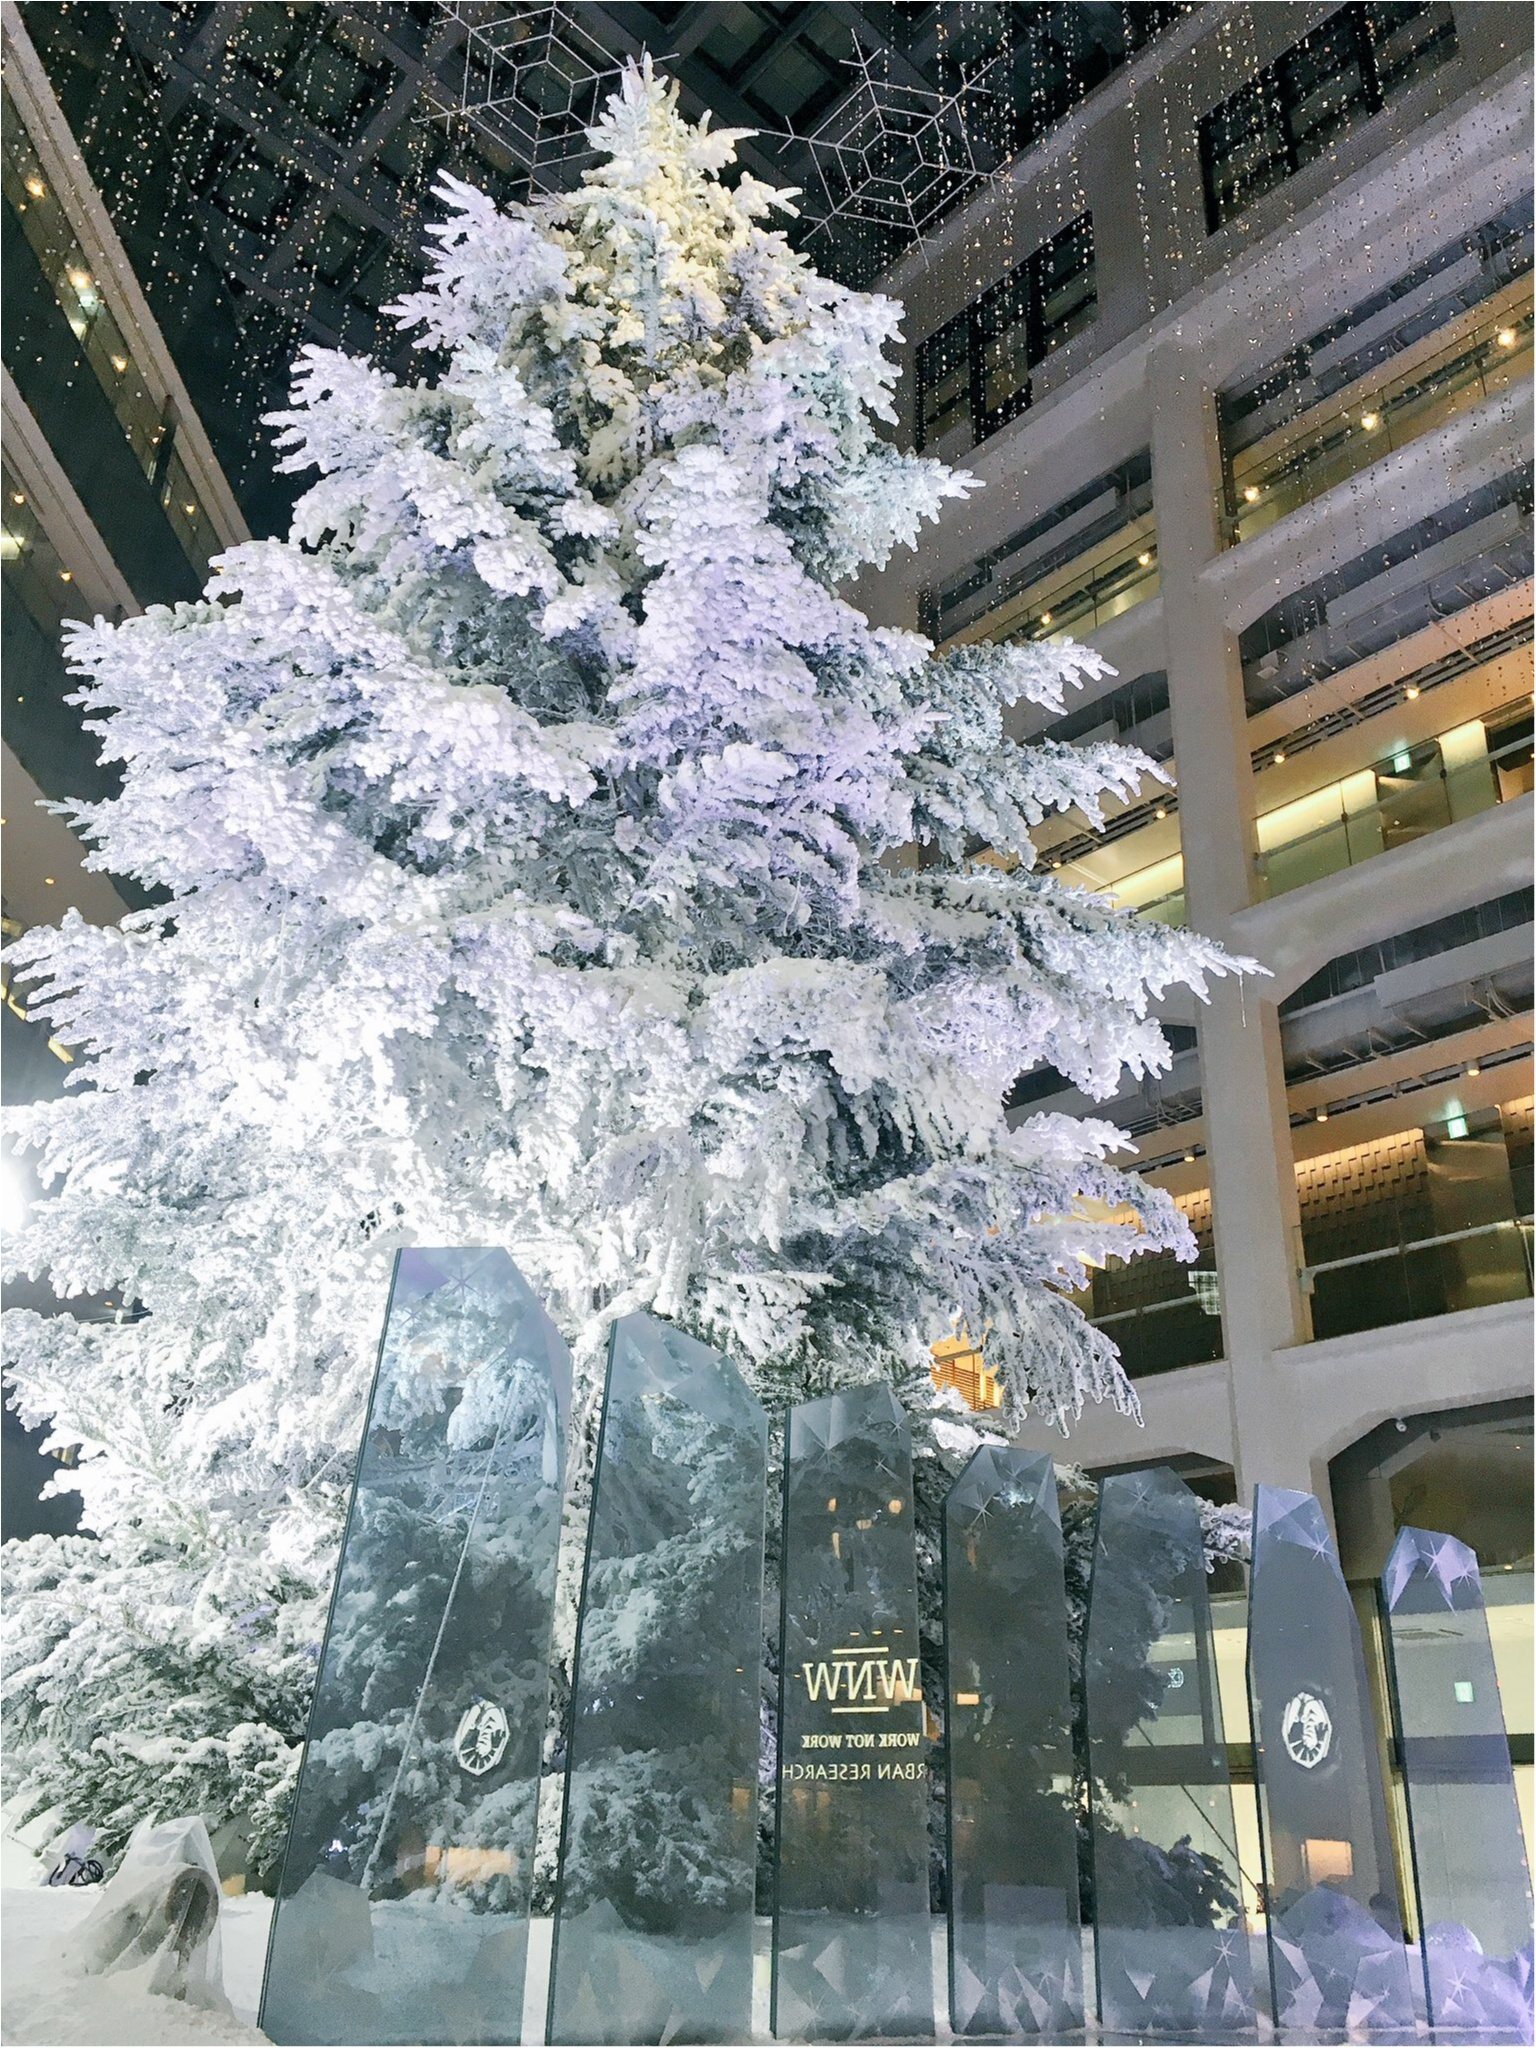 『KITTE』屋内に広がる白銀の世界…!日本最大級、本物のモミの木のクリスマスツリーが今年も点灯(*´ ˘ `*)♡_8